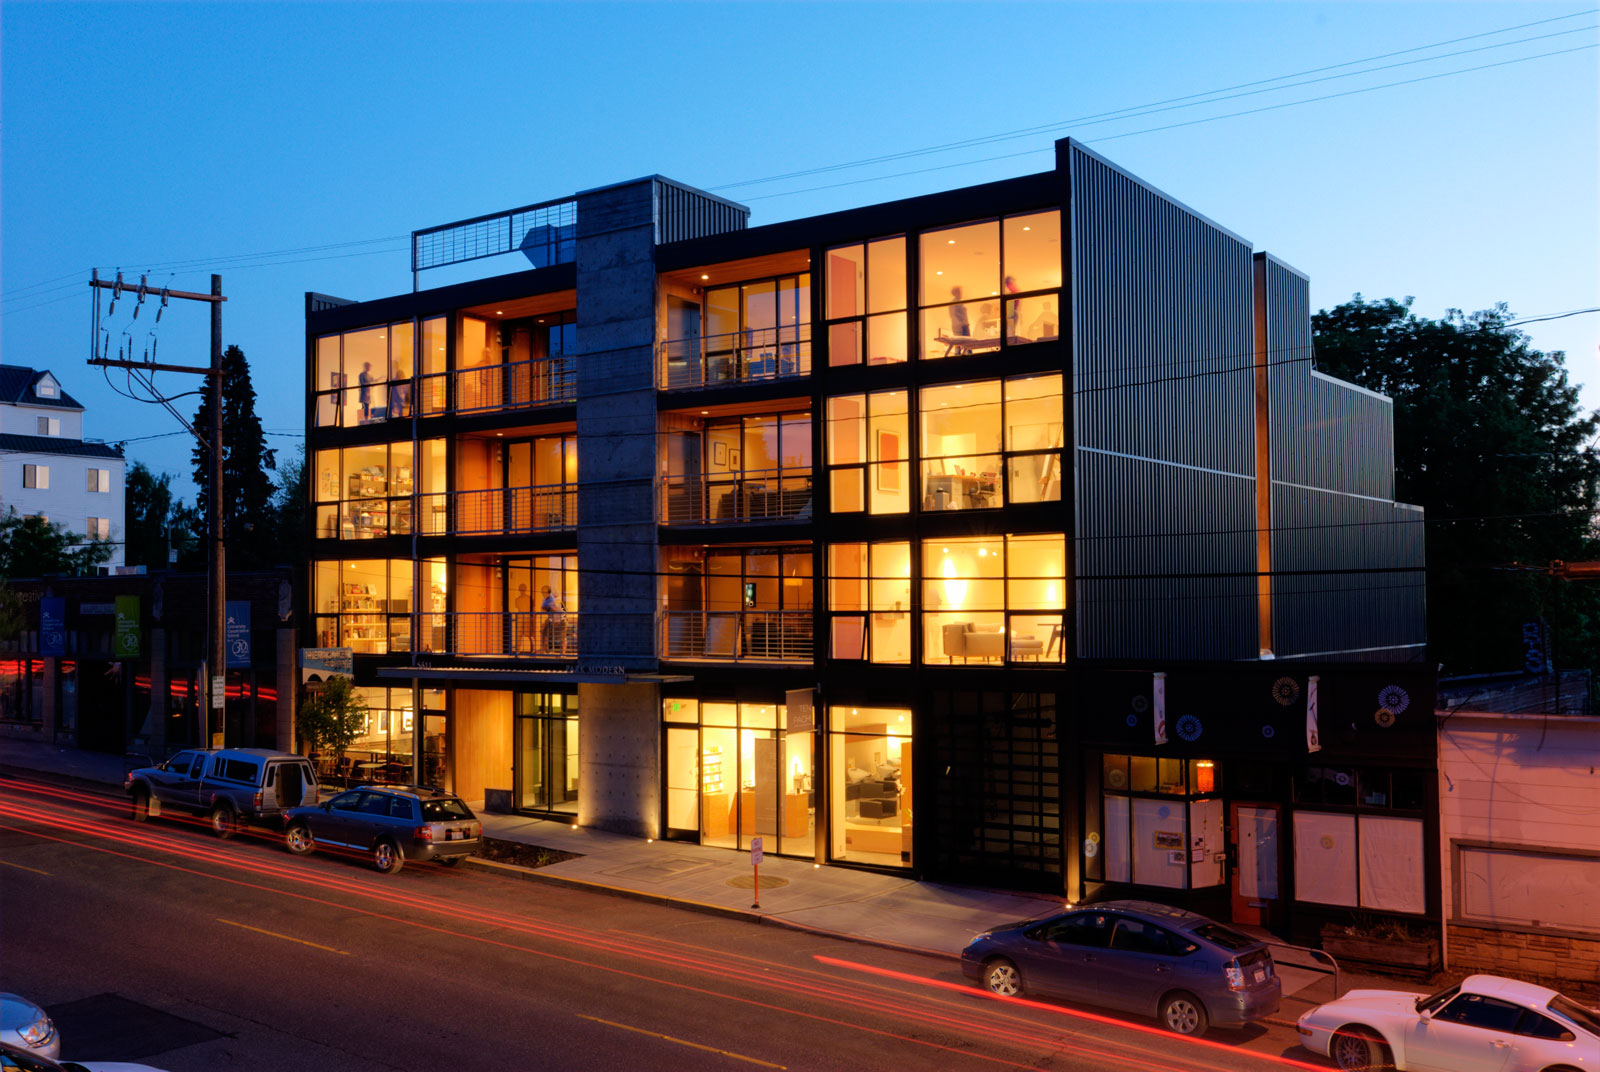 BUILD-LLC-Park-Modern-Night-01-HDR-02-photo-by-BUILDLLC